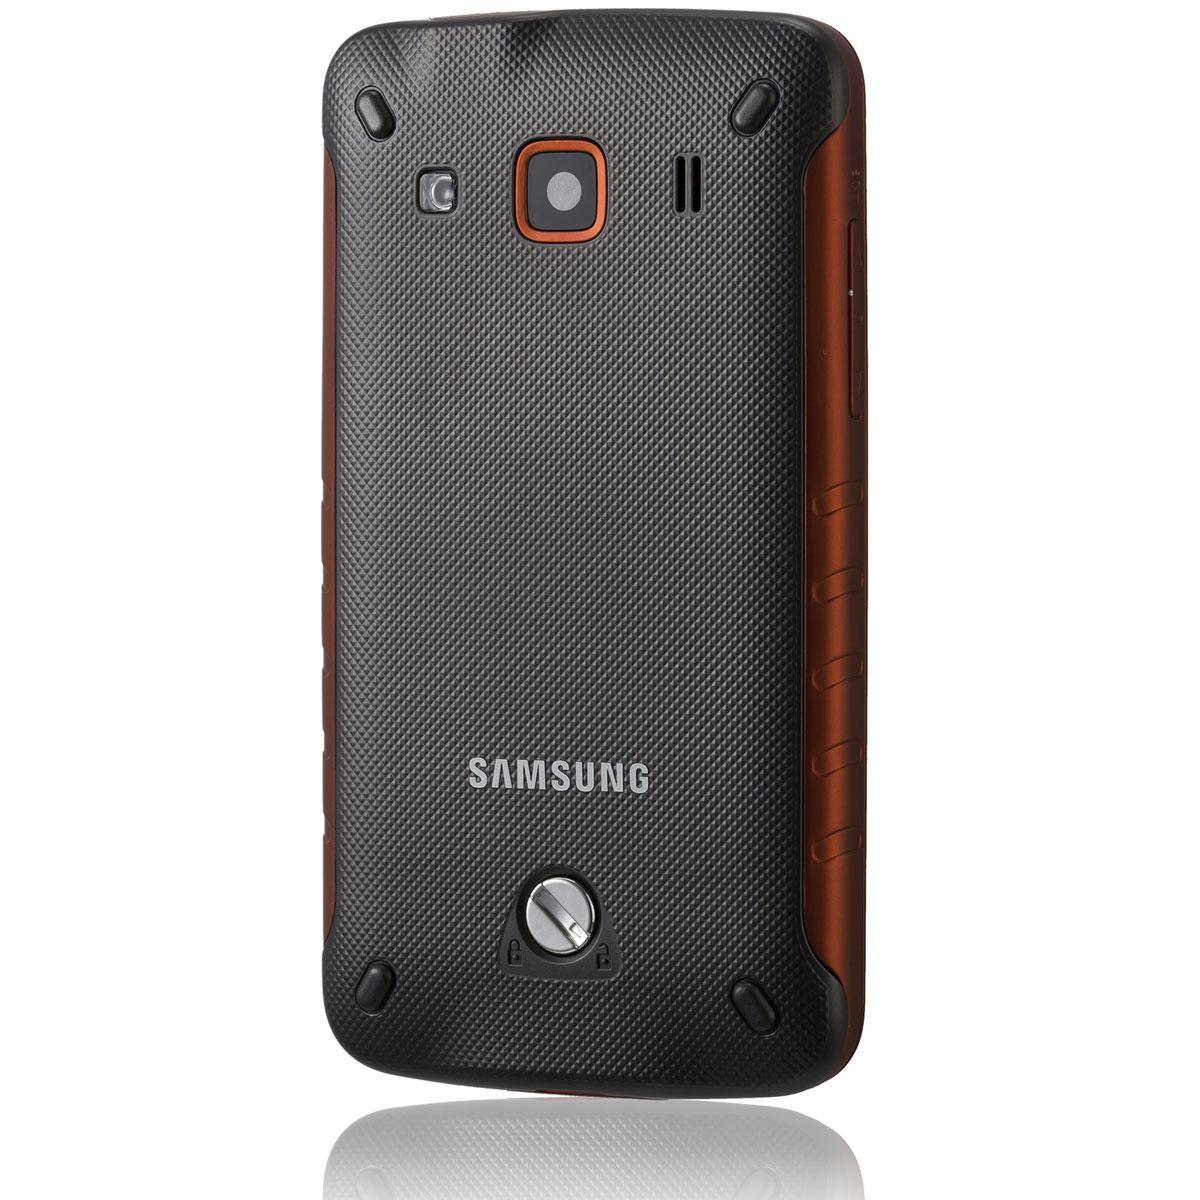 Samsung Galaxy Xcover - Orange - Débloqué